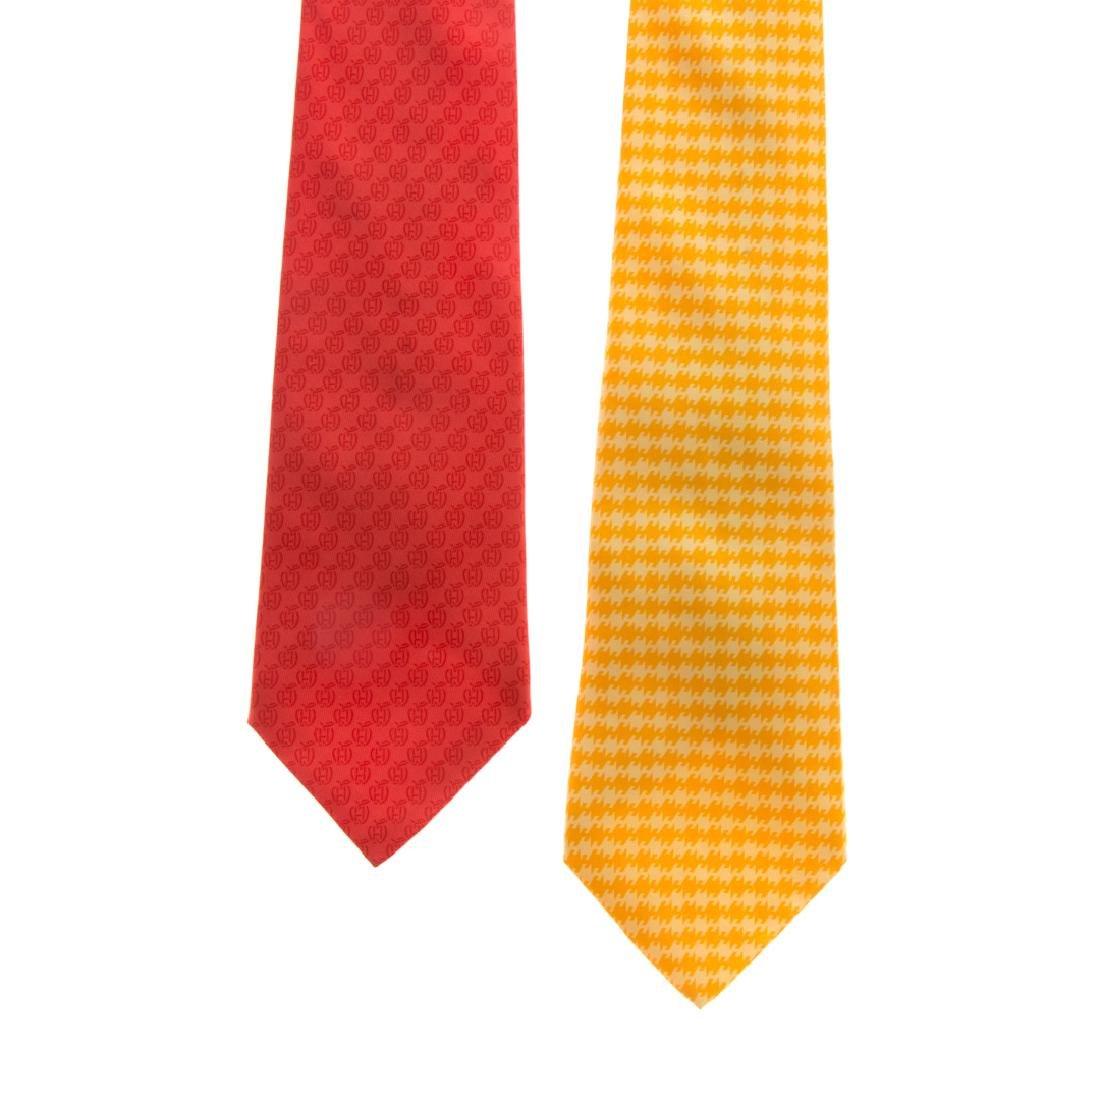 Hermès Apple Print Tie & Hounds Tooth Print Tie